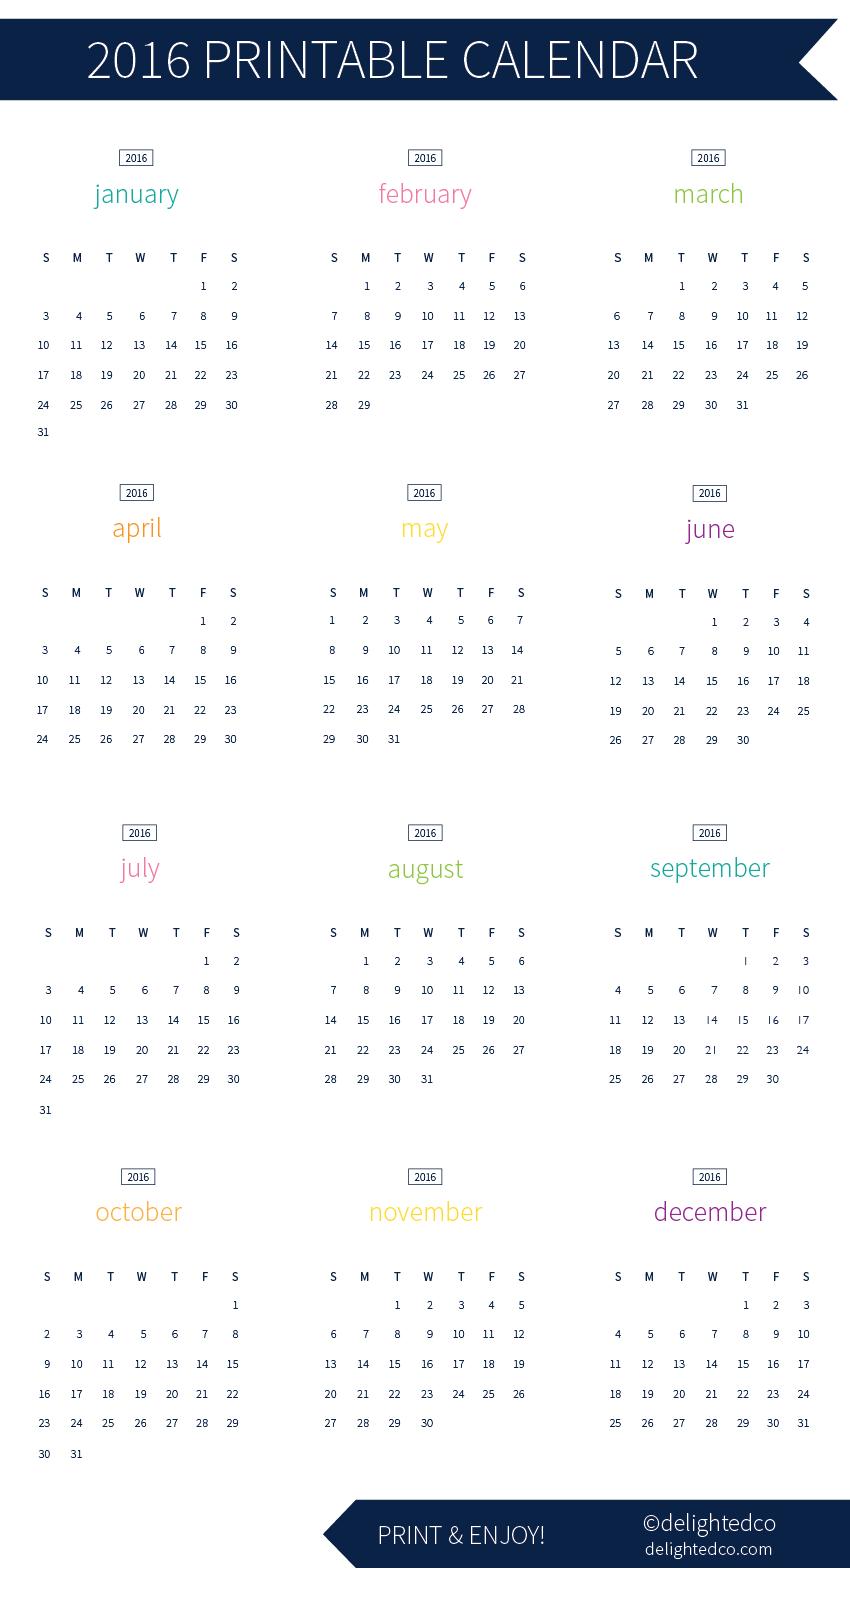 2016 Calendar Free Download || DelightedCo.com